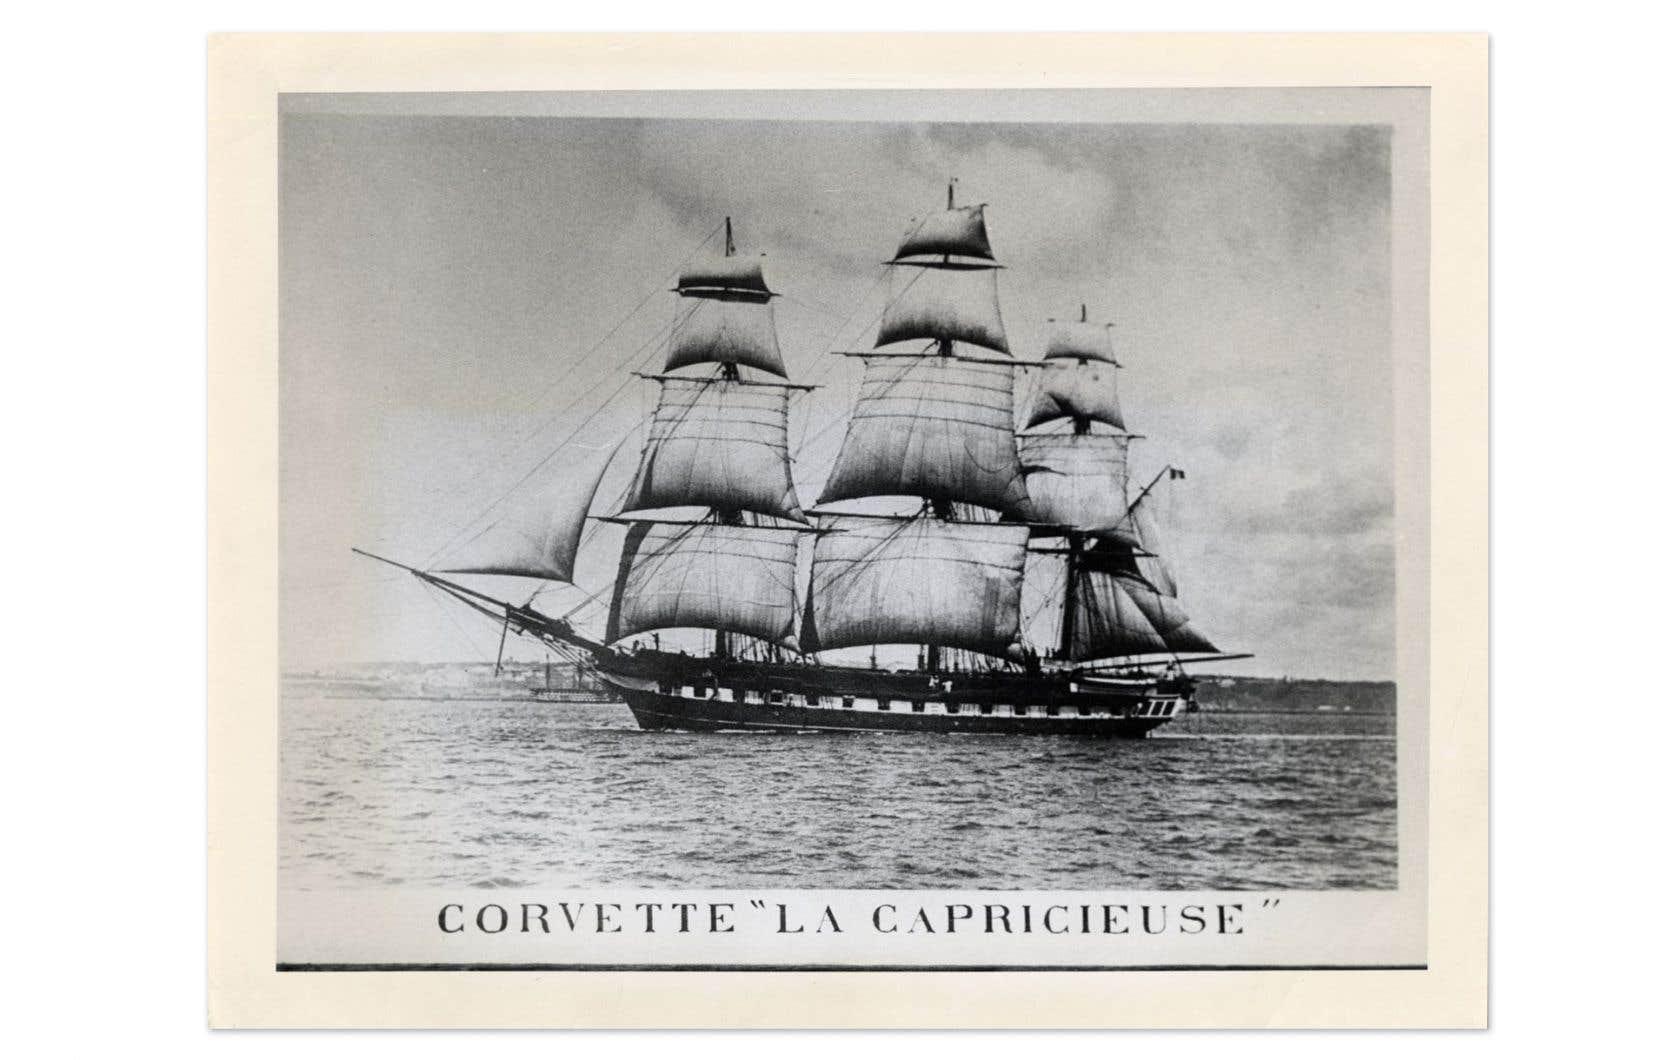 Corvette «La Capricieuse»